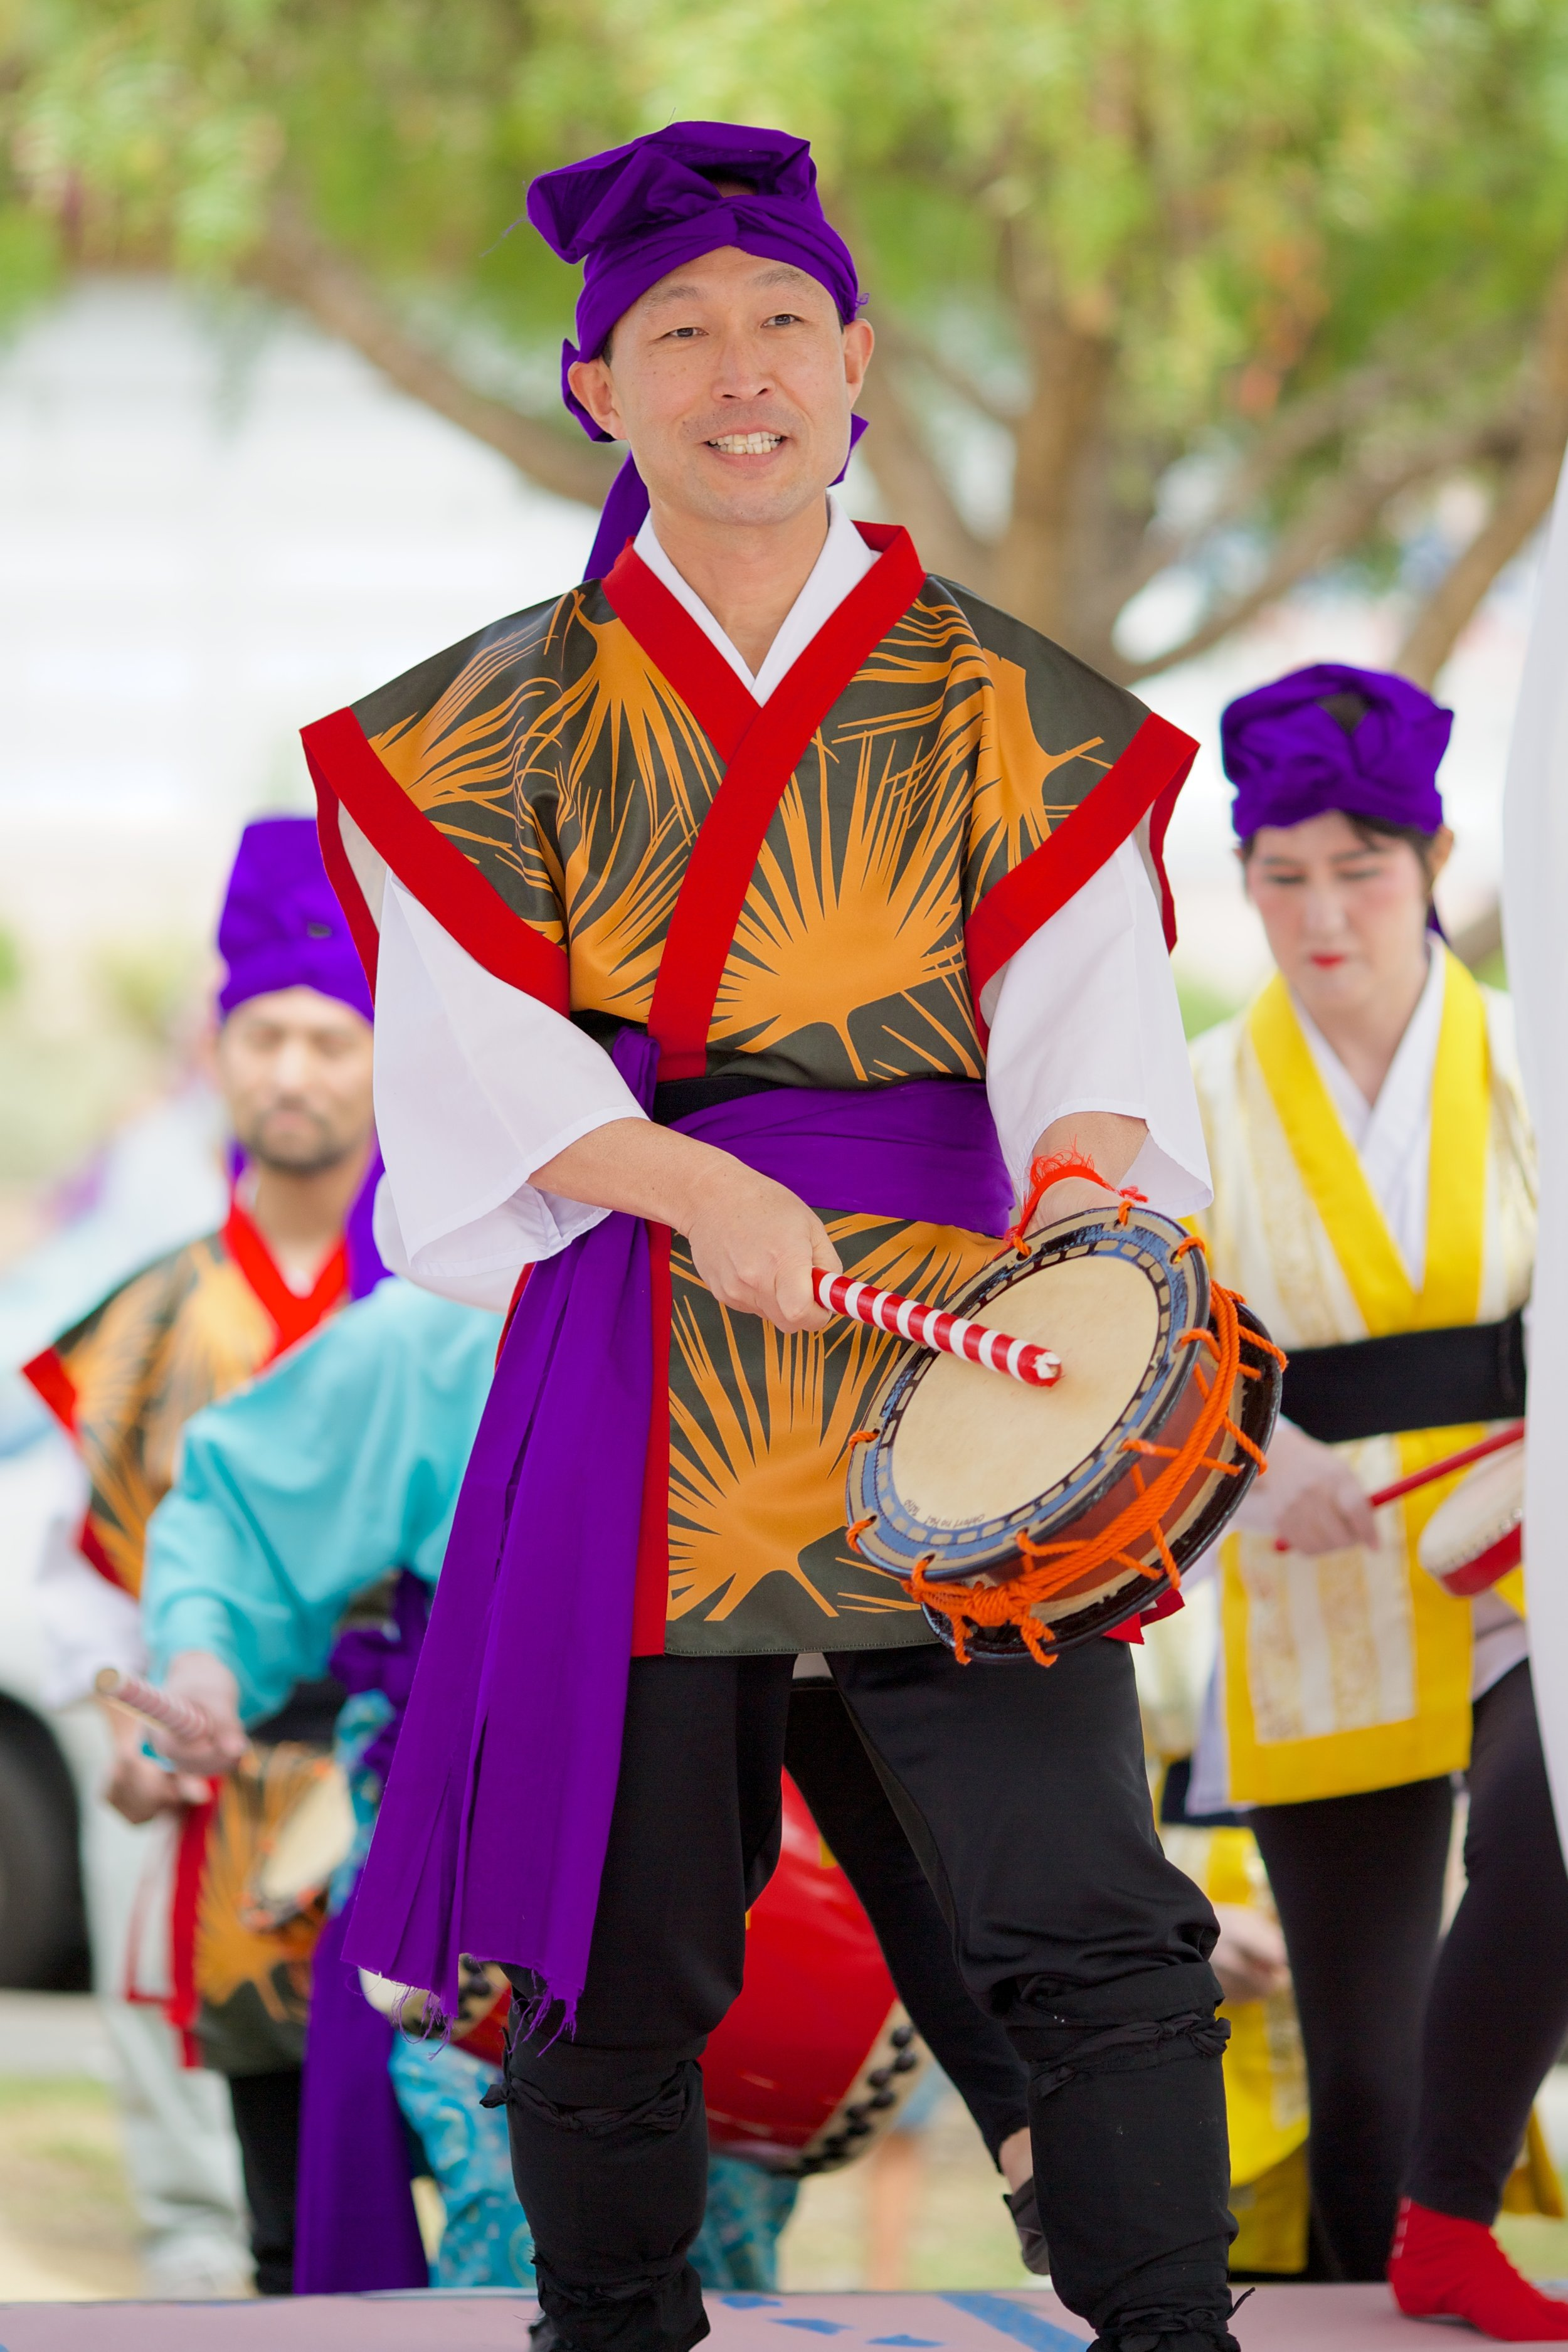 ohtori-no-kai---japanese-cultural-fair-of-santa-cruz-2015_19408675950_o.jpg